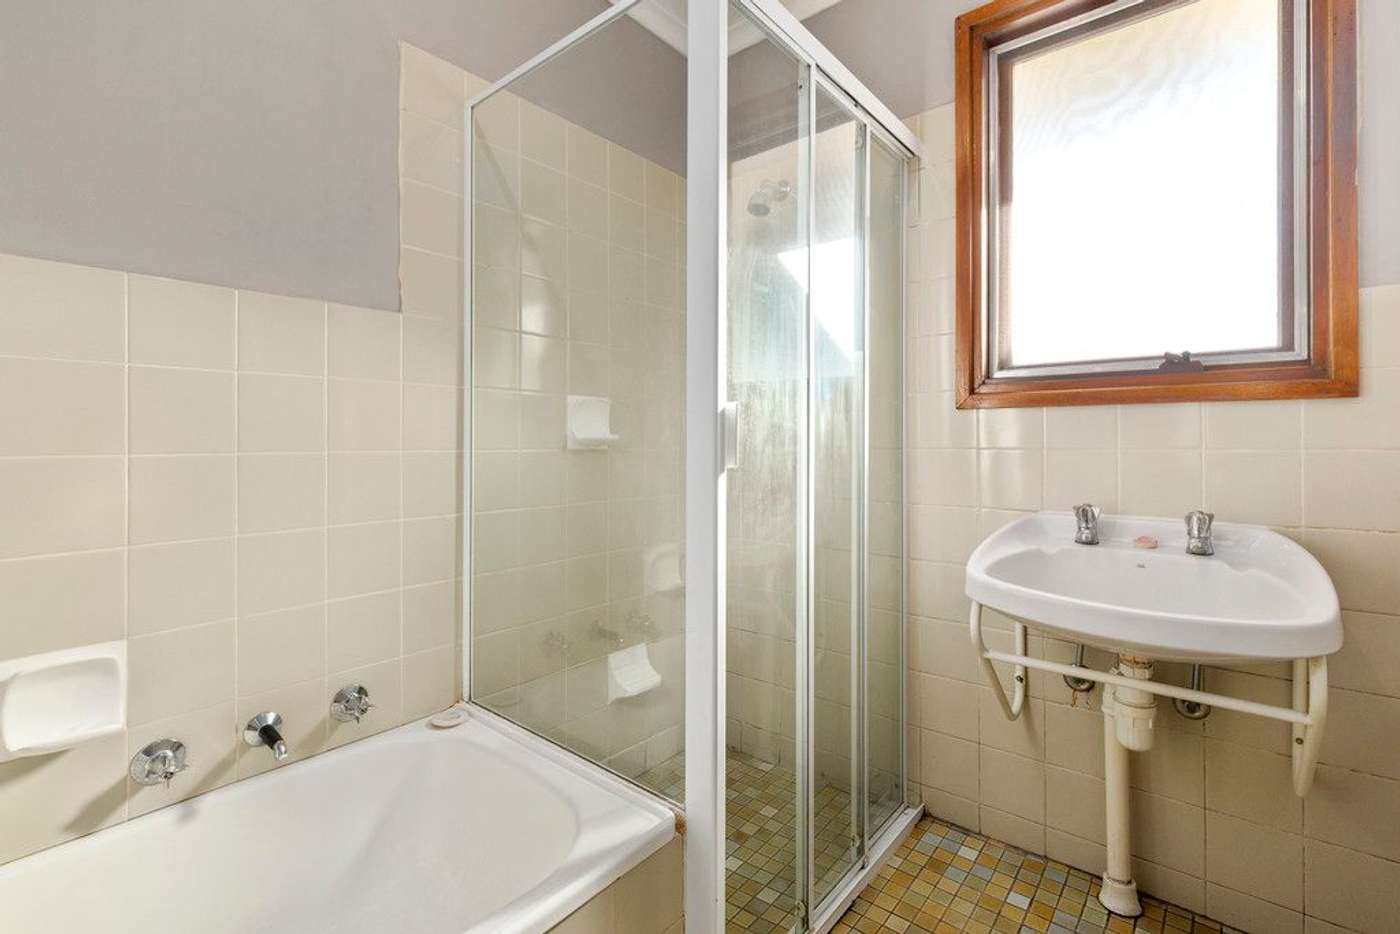 Sixth view of Homely house listing, 7 Marana Avenue, Morphett Vale SA 5162